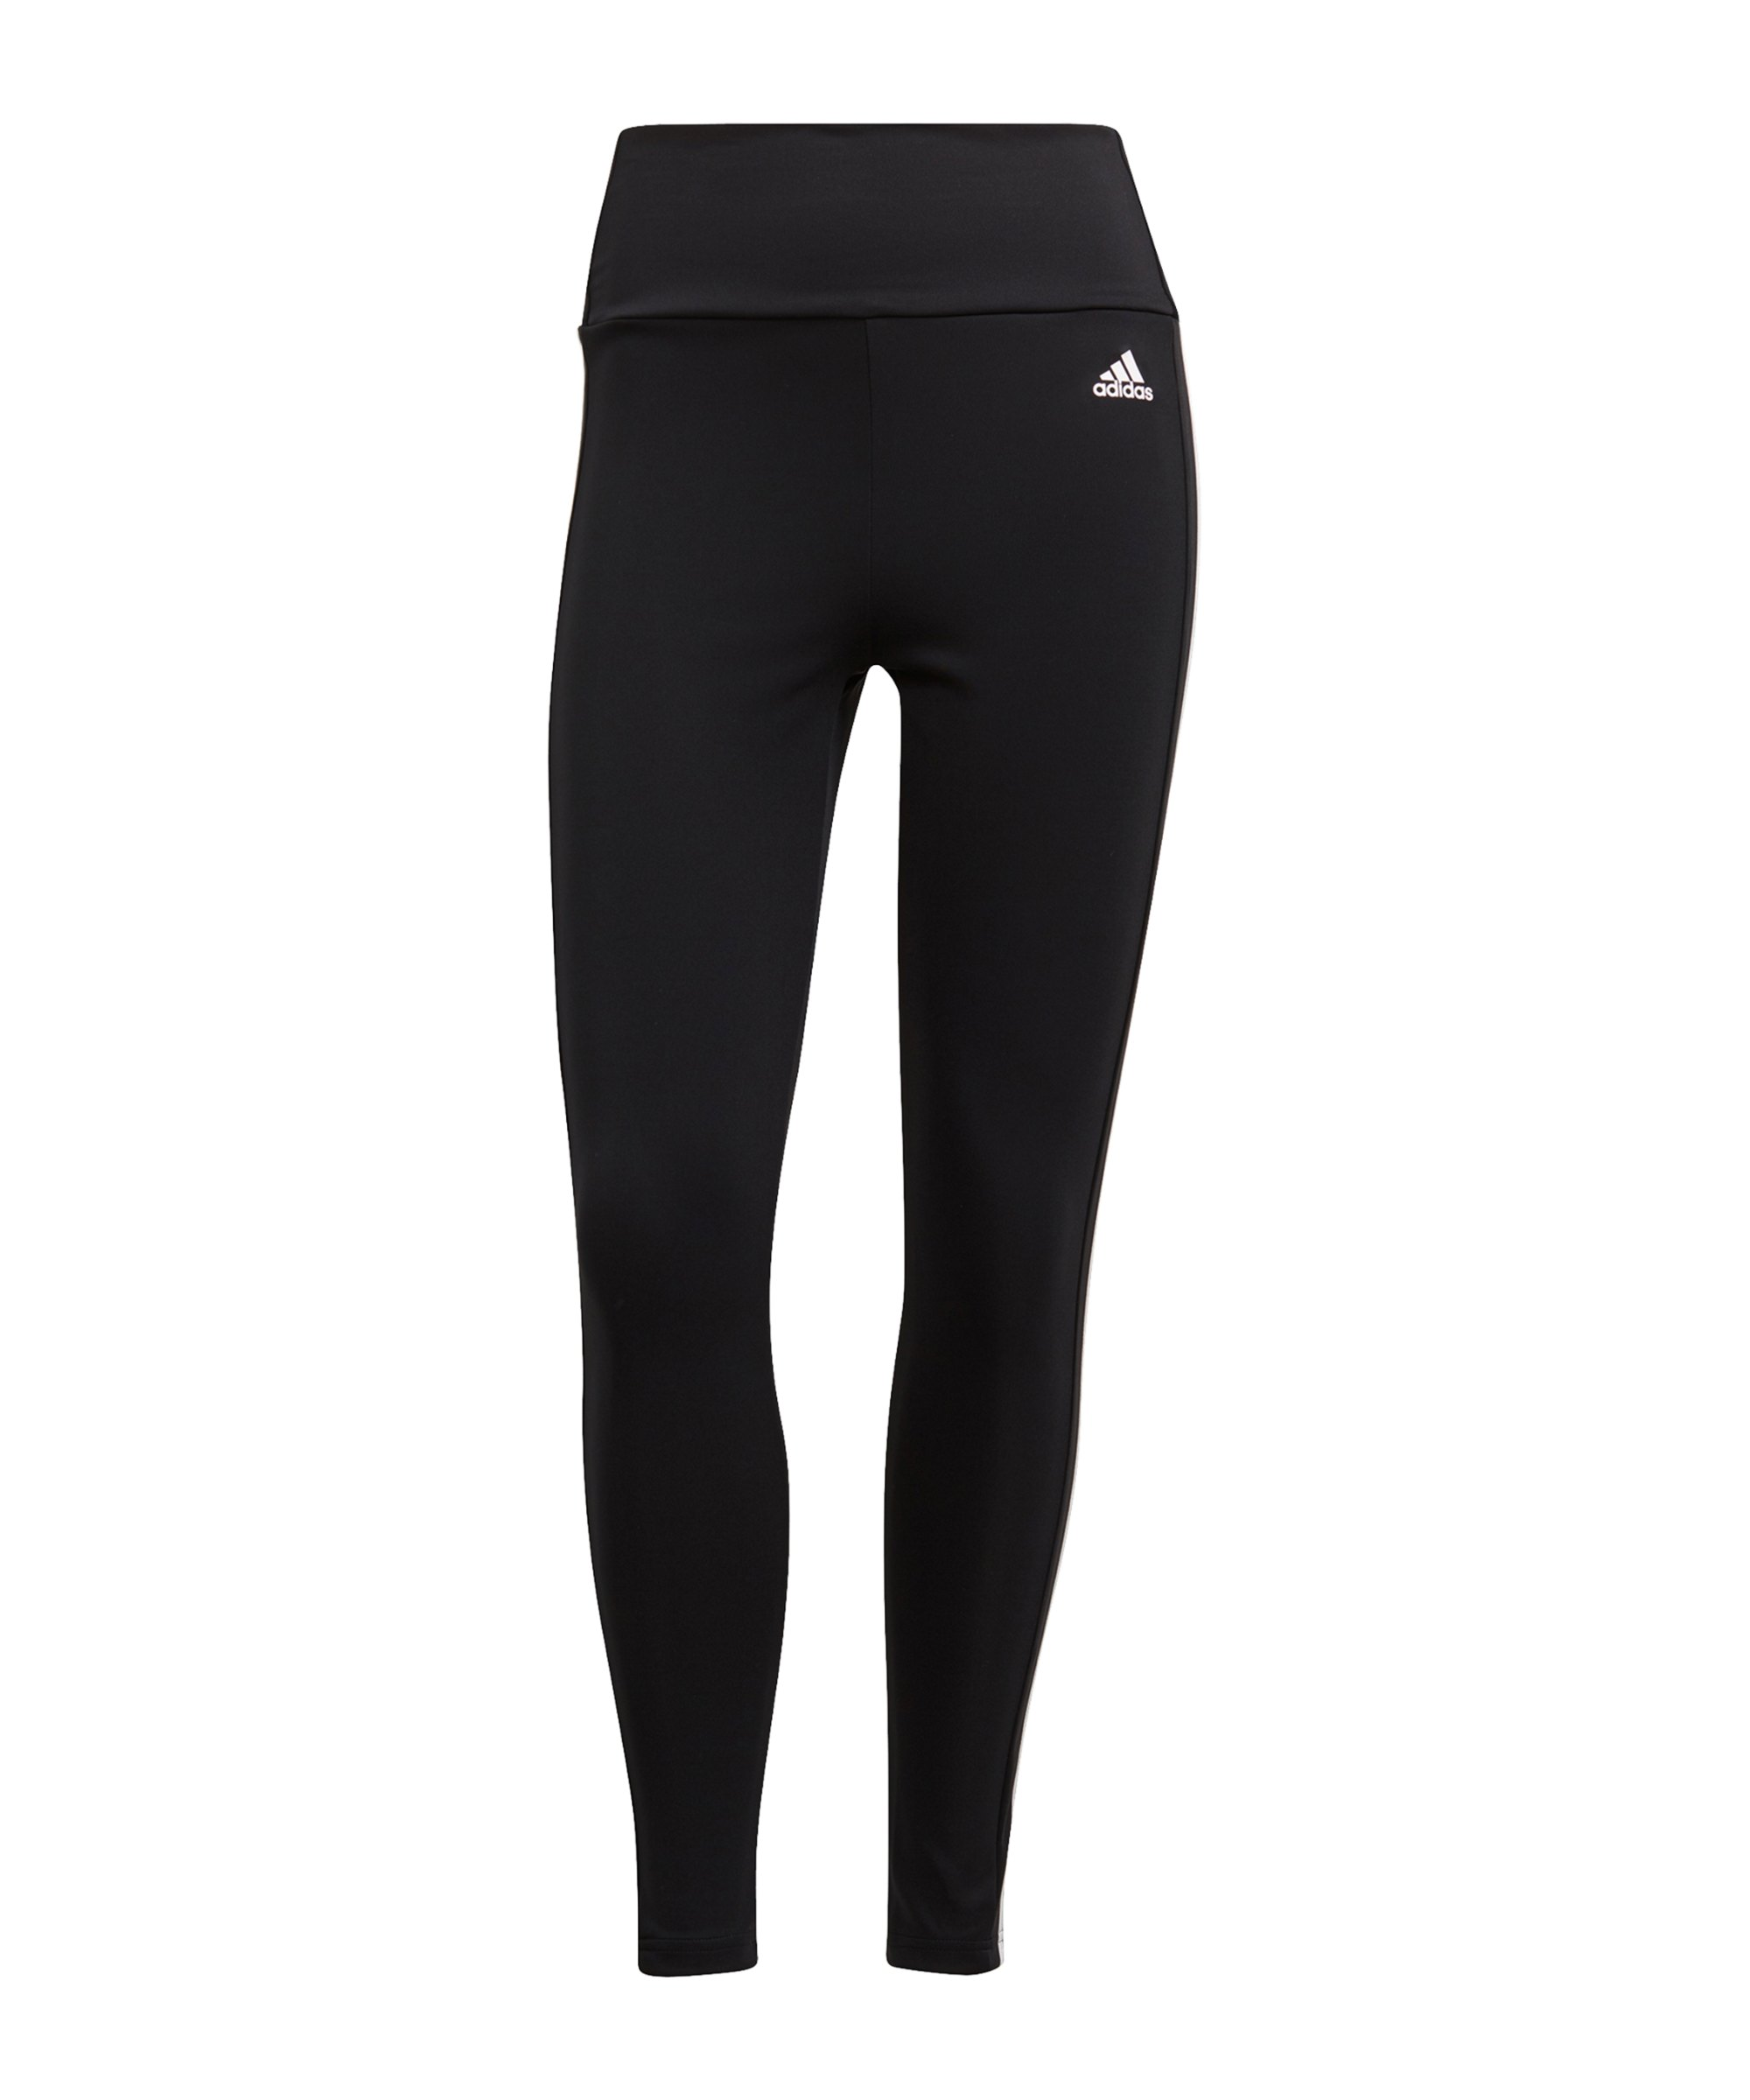 adidas 3S 7/8 Leggings Damen Running Schwarz - schwarz